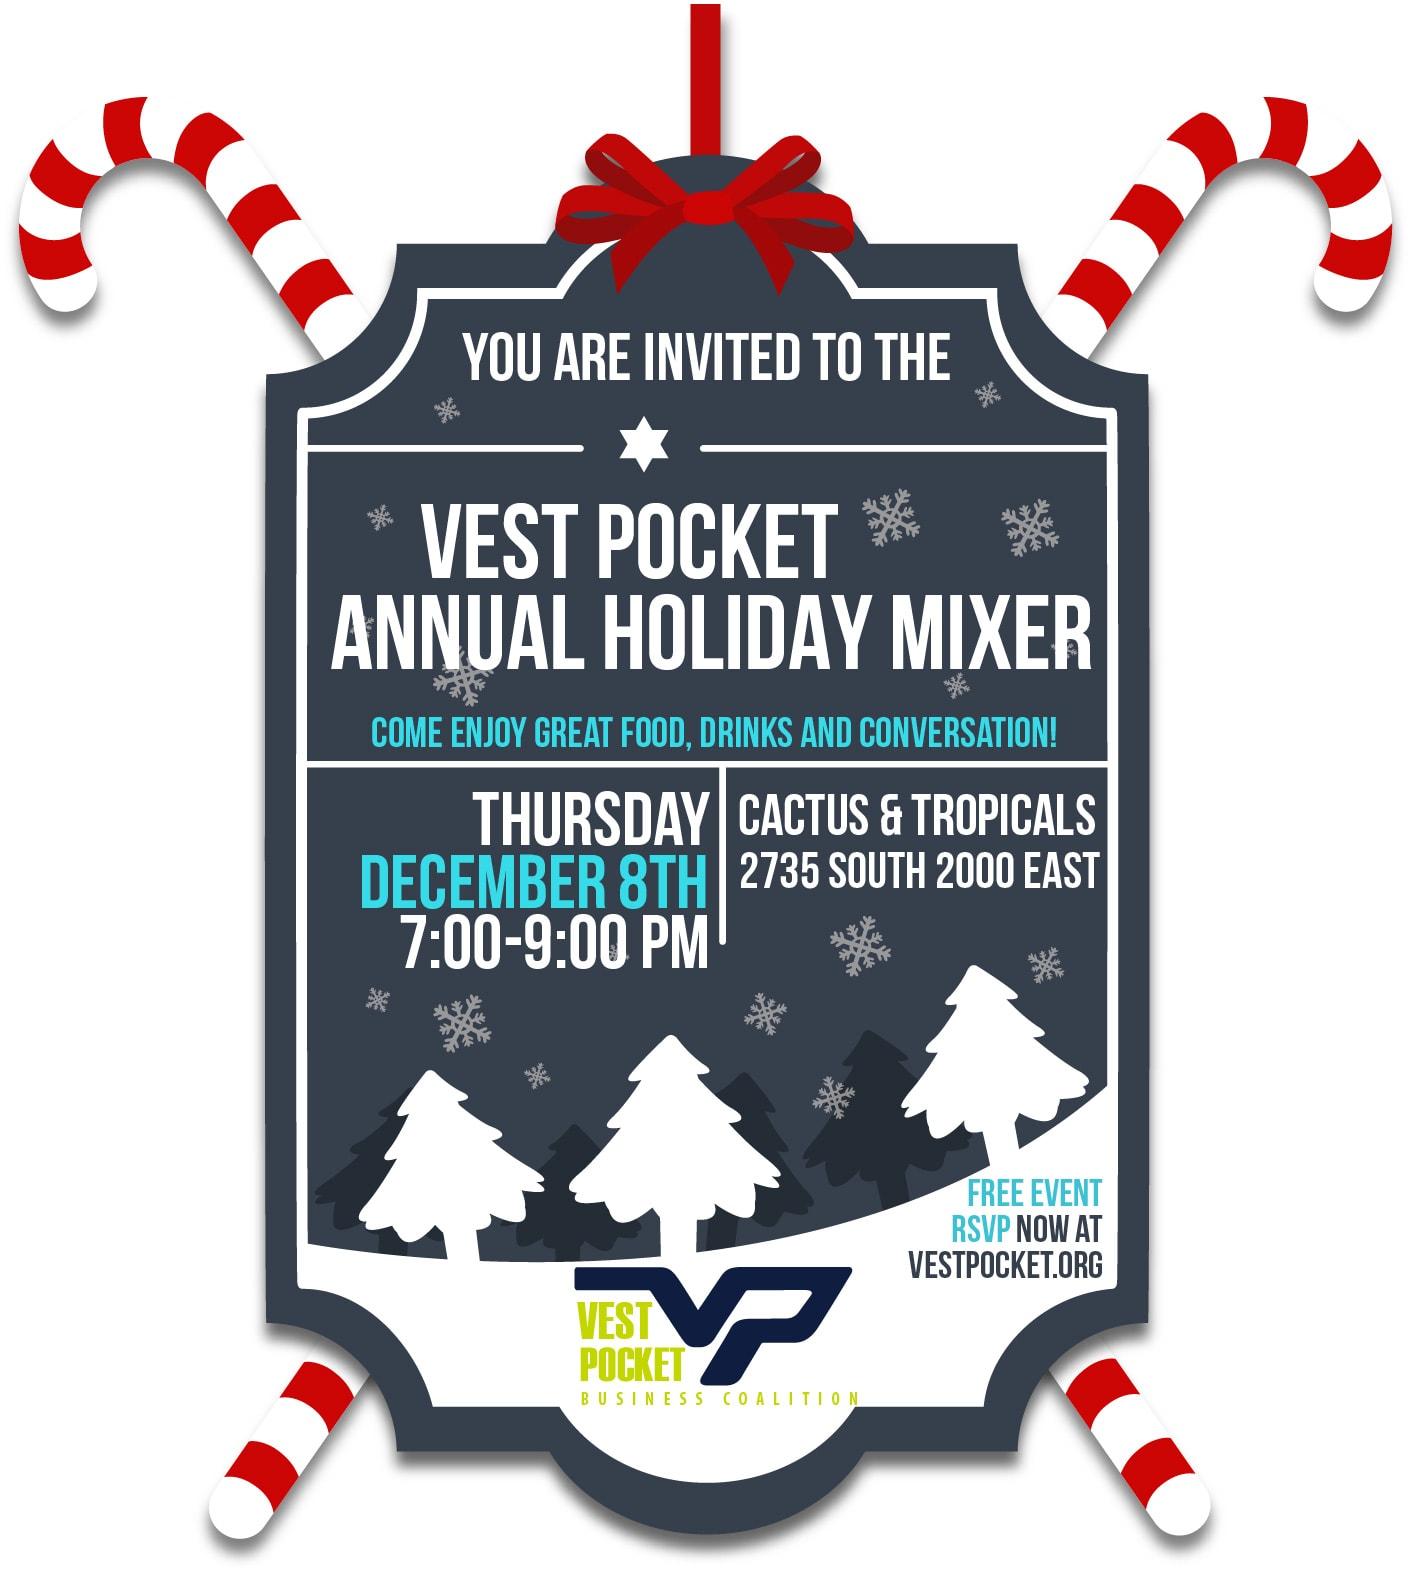 Vest Pocket Annual Holiday Mixer